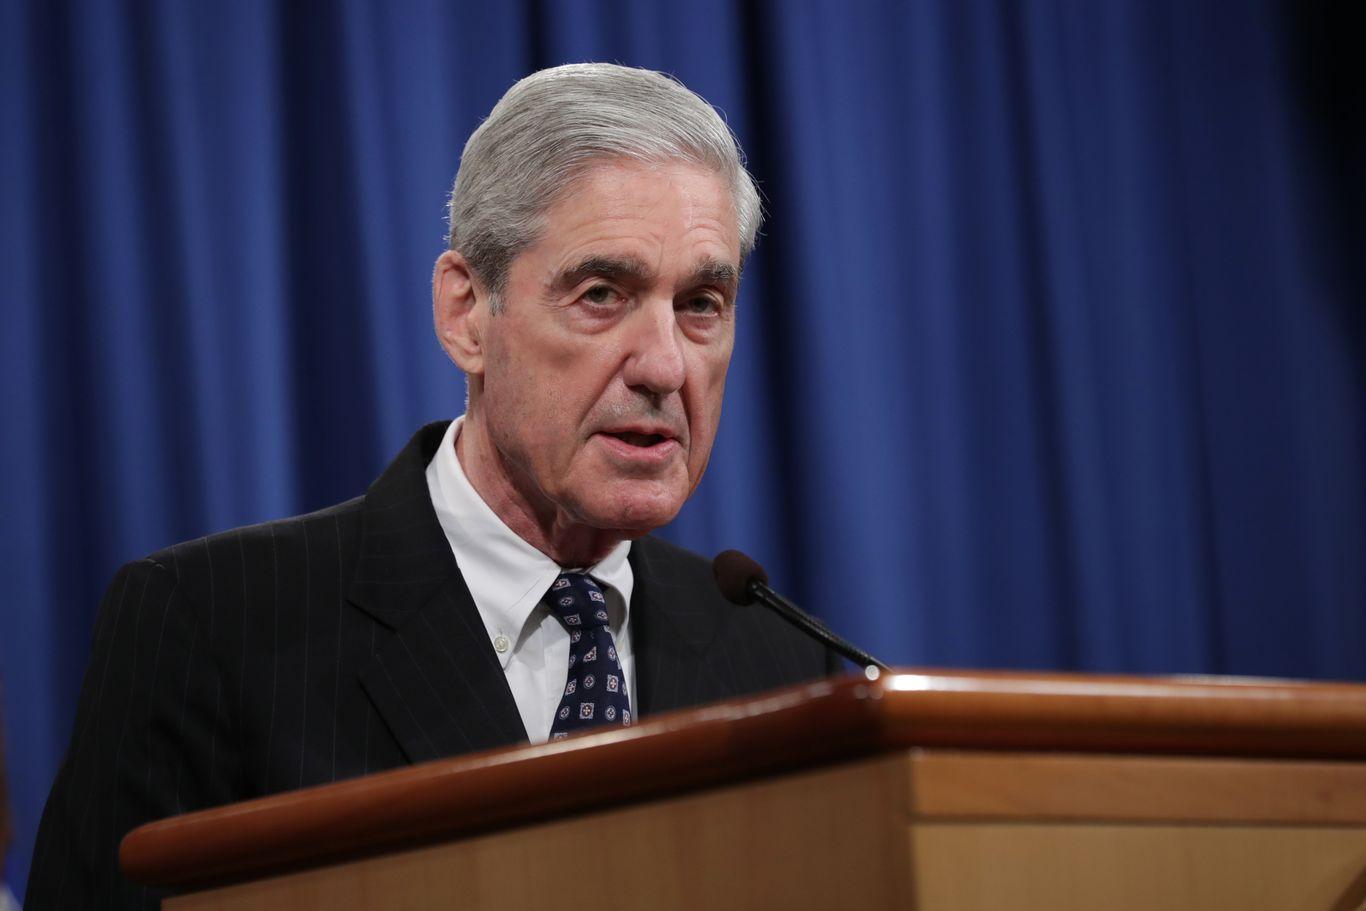 DOJ releases new Mueller report details on Roger Stone and Julian Assange thumbnail